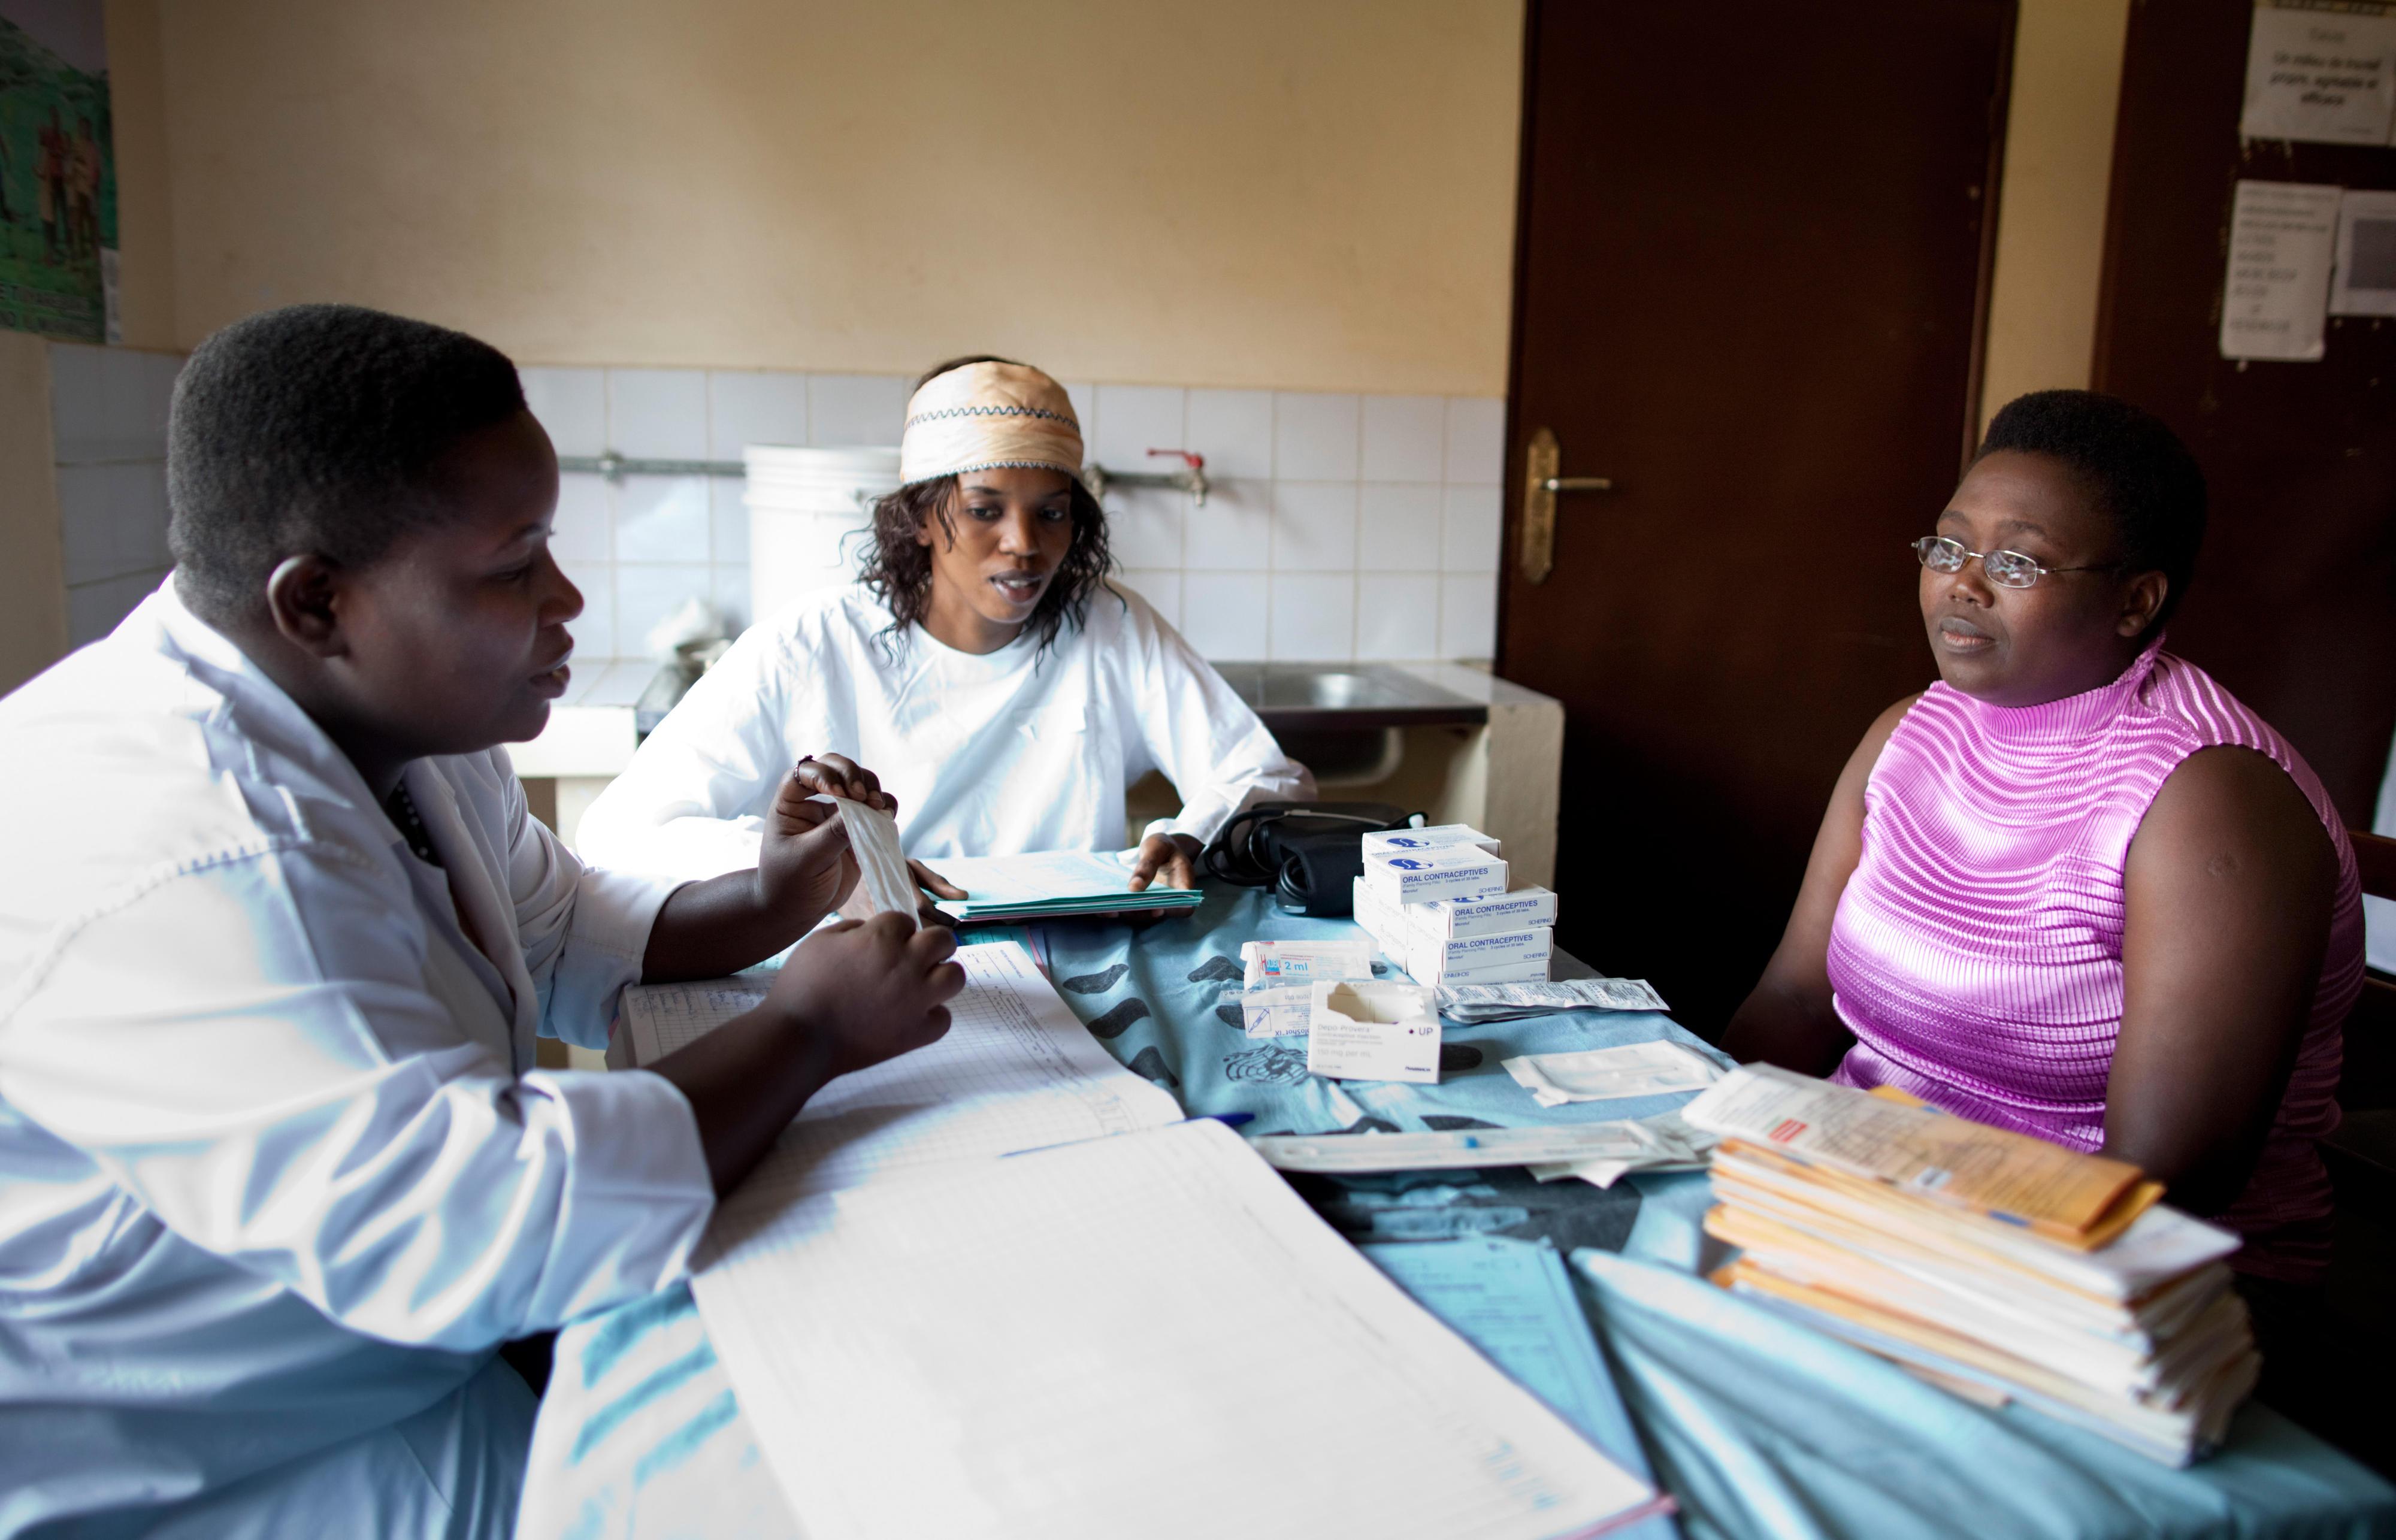 Beratung zum Thema Verhütung in einer Gesundheitsstation in Bujumbura, Burundi